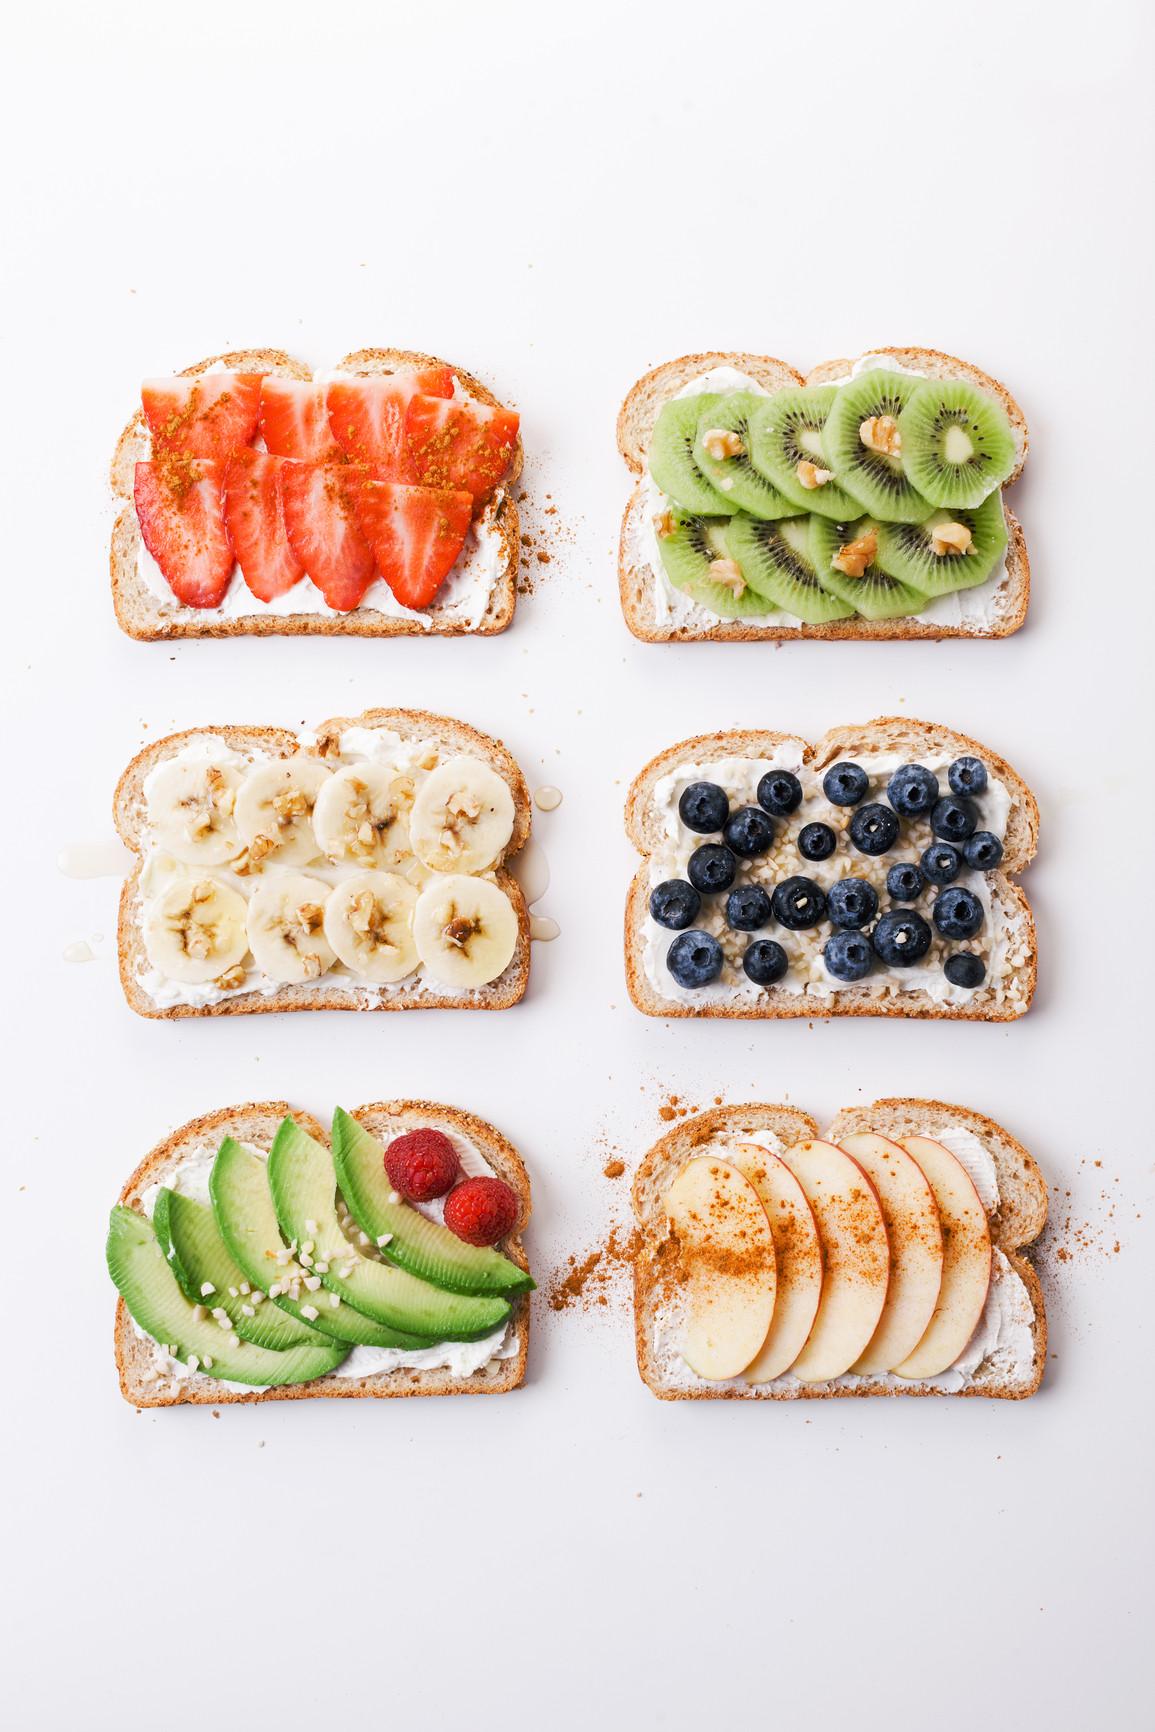 Healthy Breakfast Toast  6 Easy & Creative Ways to Fancy Up Breakfast Toasts Hot